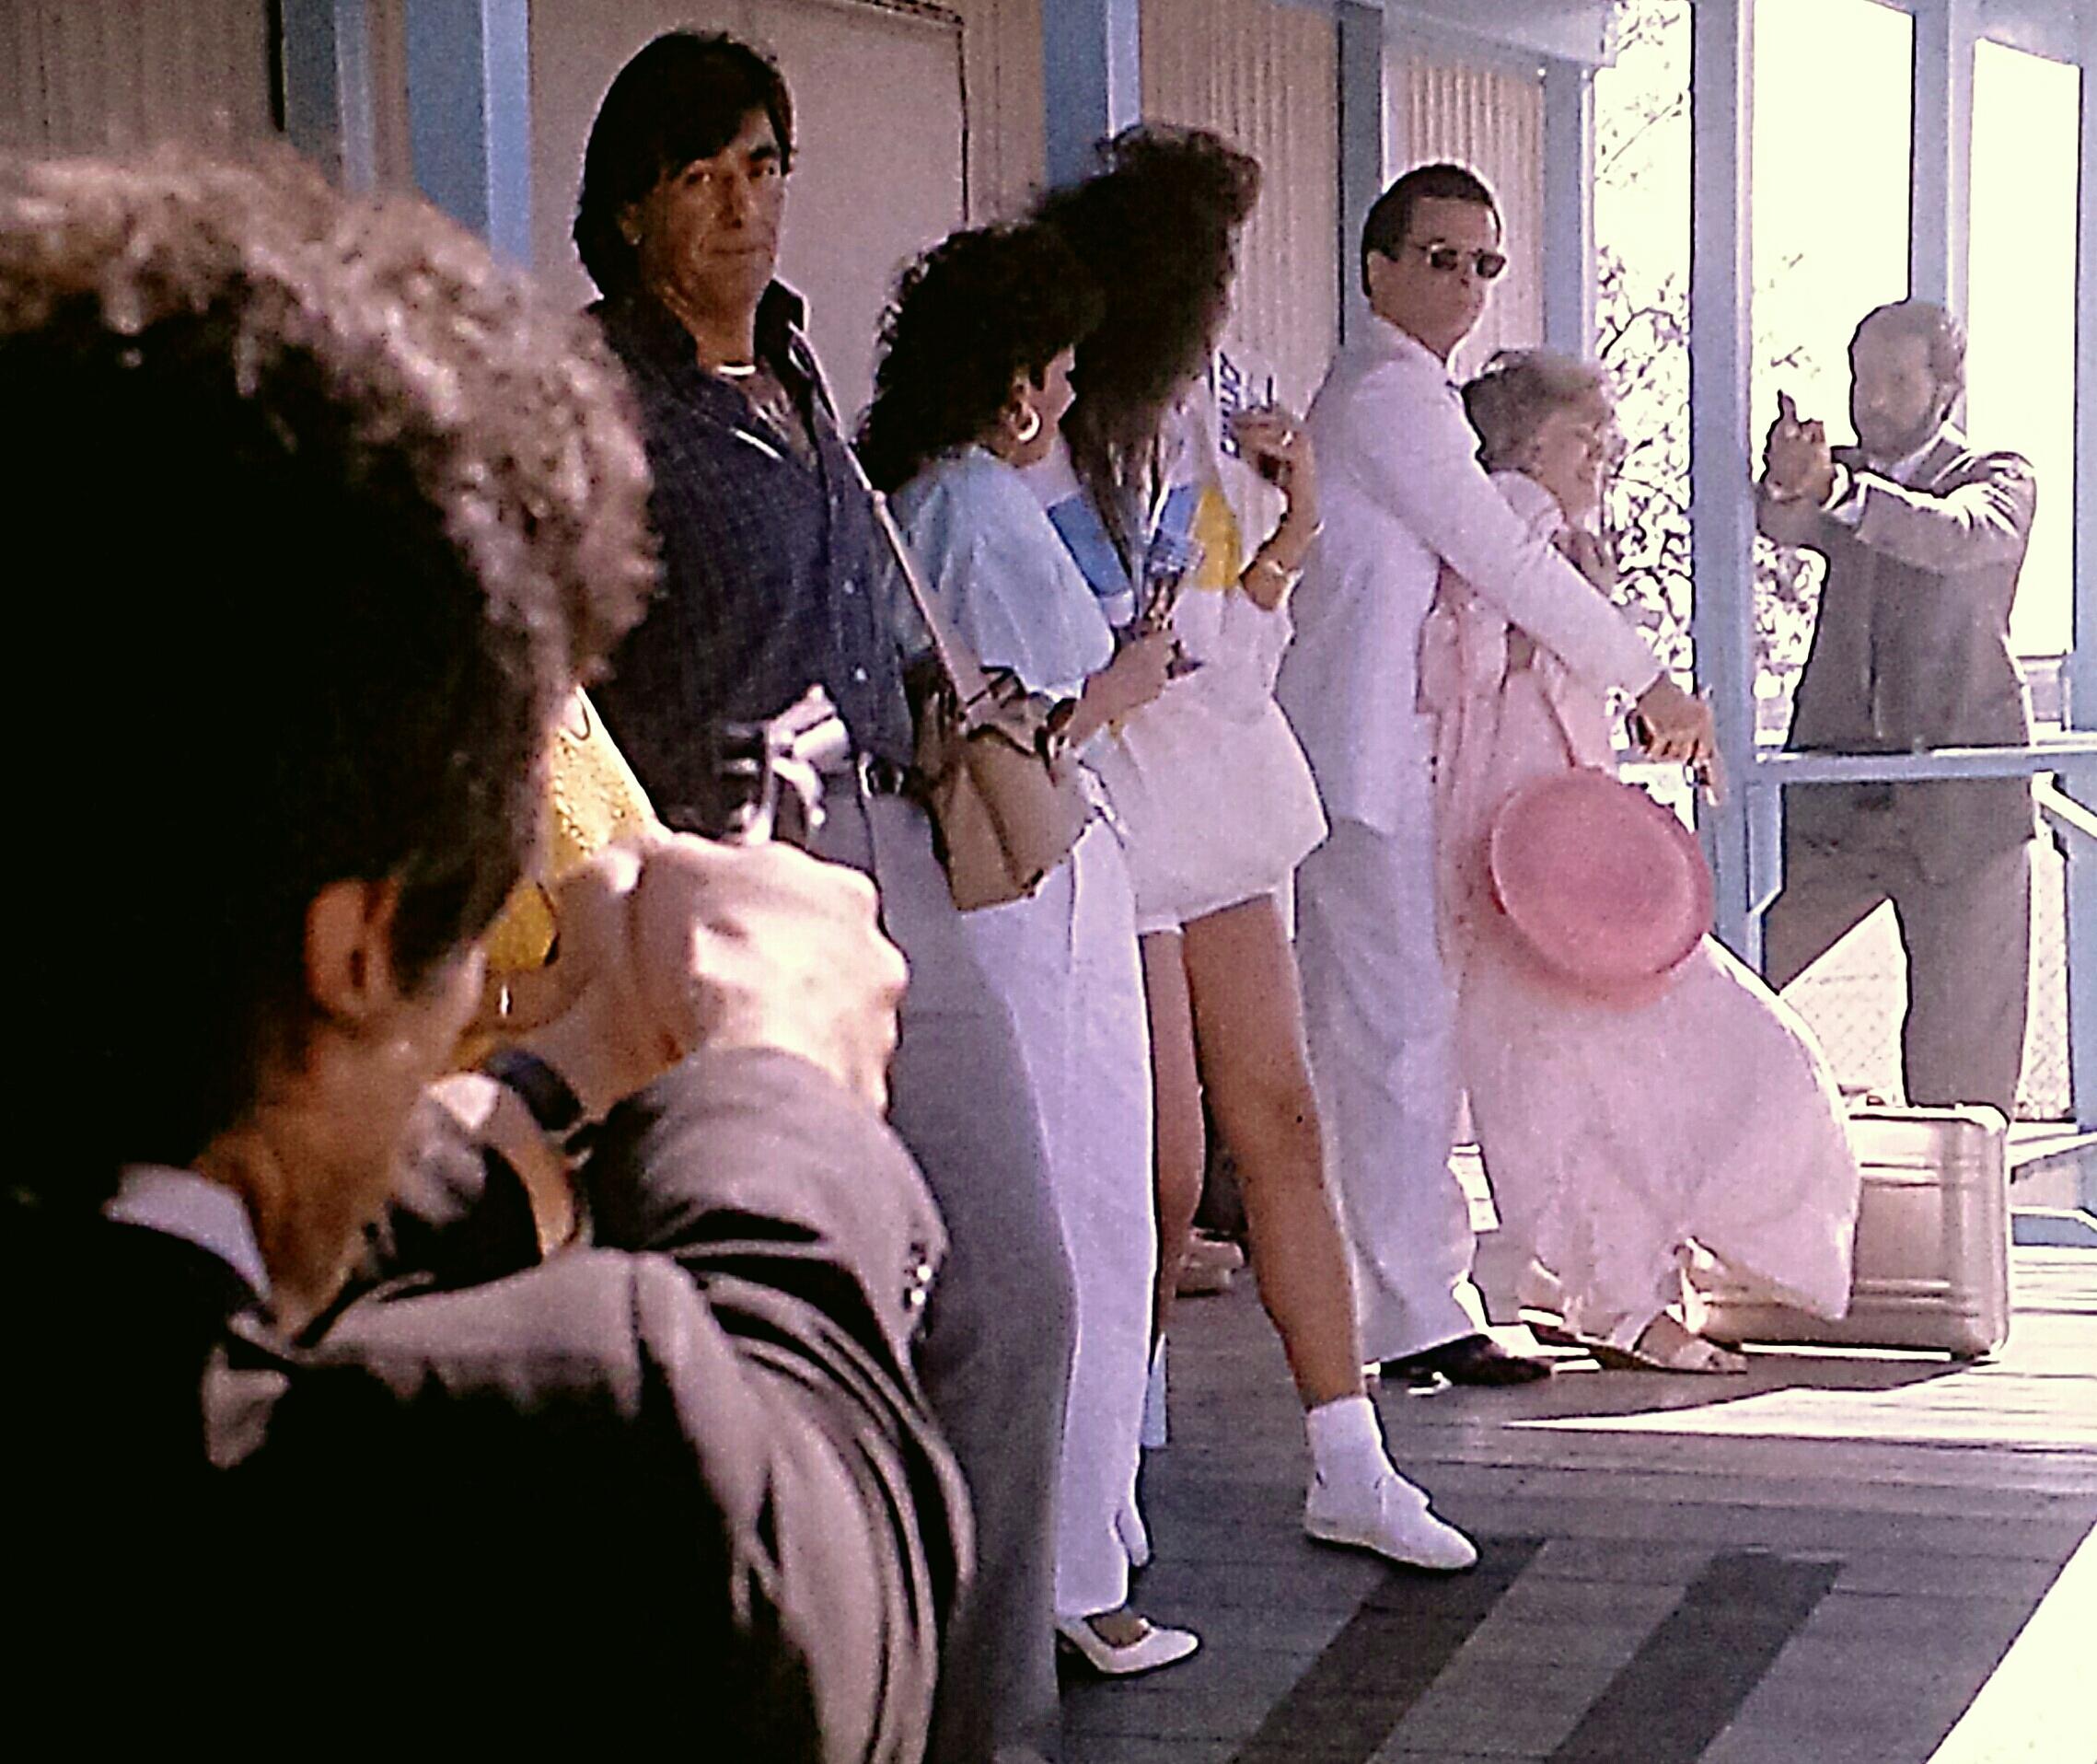 Edward James Olmos, Tony Plana, and Philip Michael Thomas in Miami Vice (1984)